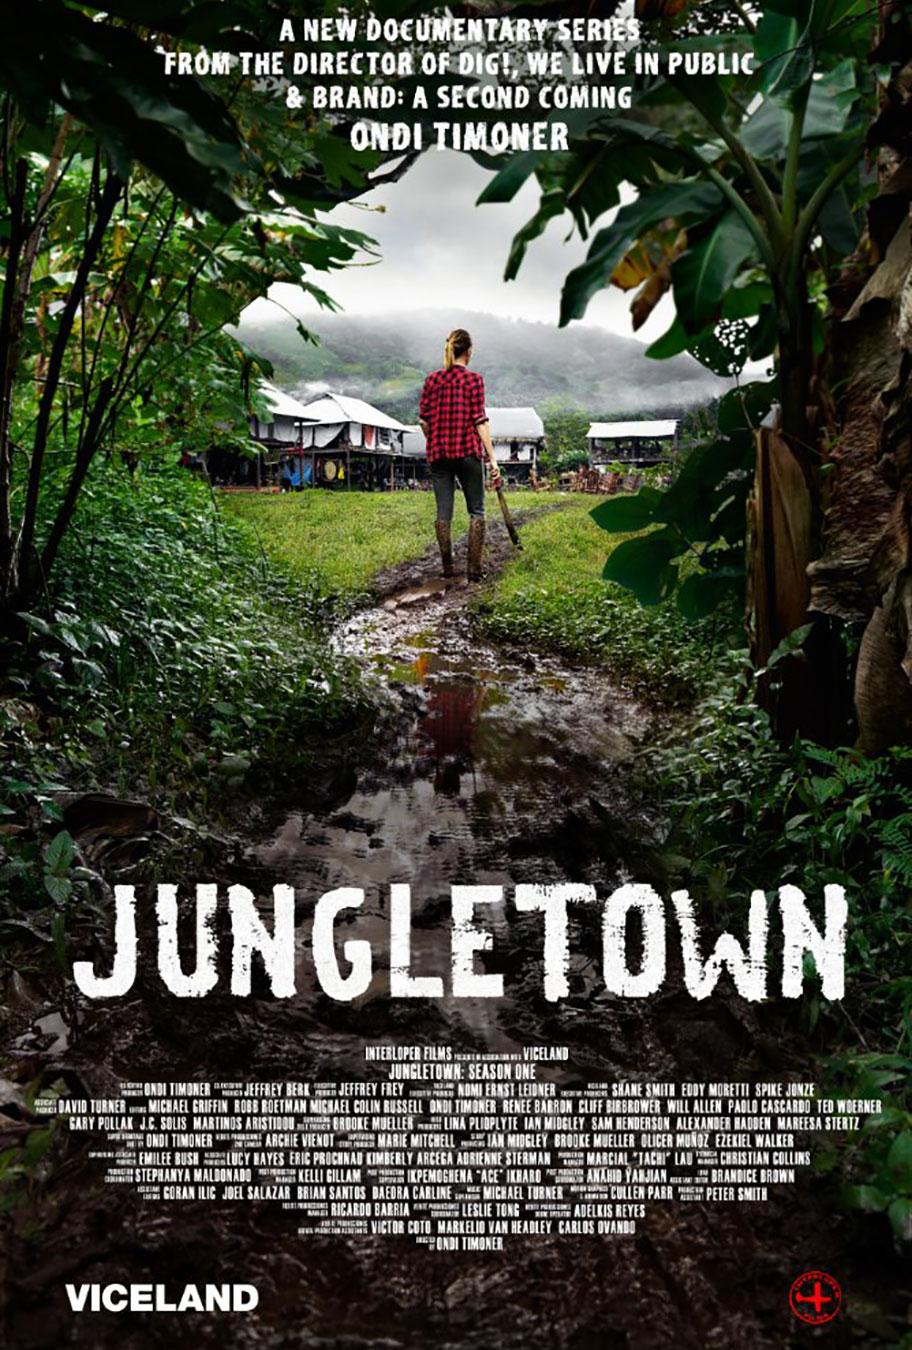 stephen-becker-jungletown-poster.jpg